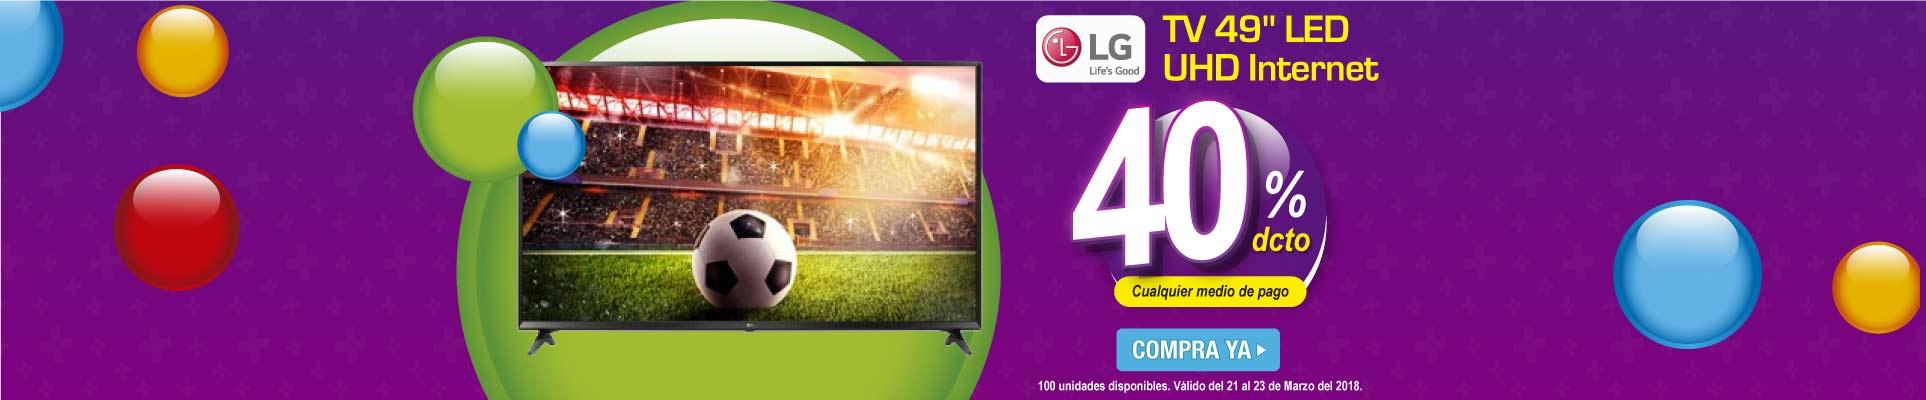 PPAL ALKP-2TV-Celular Lenovo Vibe B 4G DS-prod-Marzo21-23